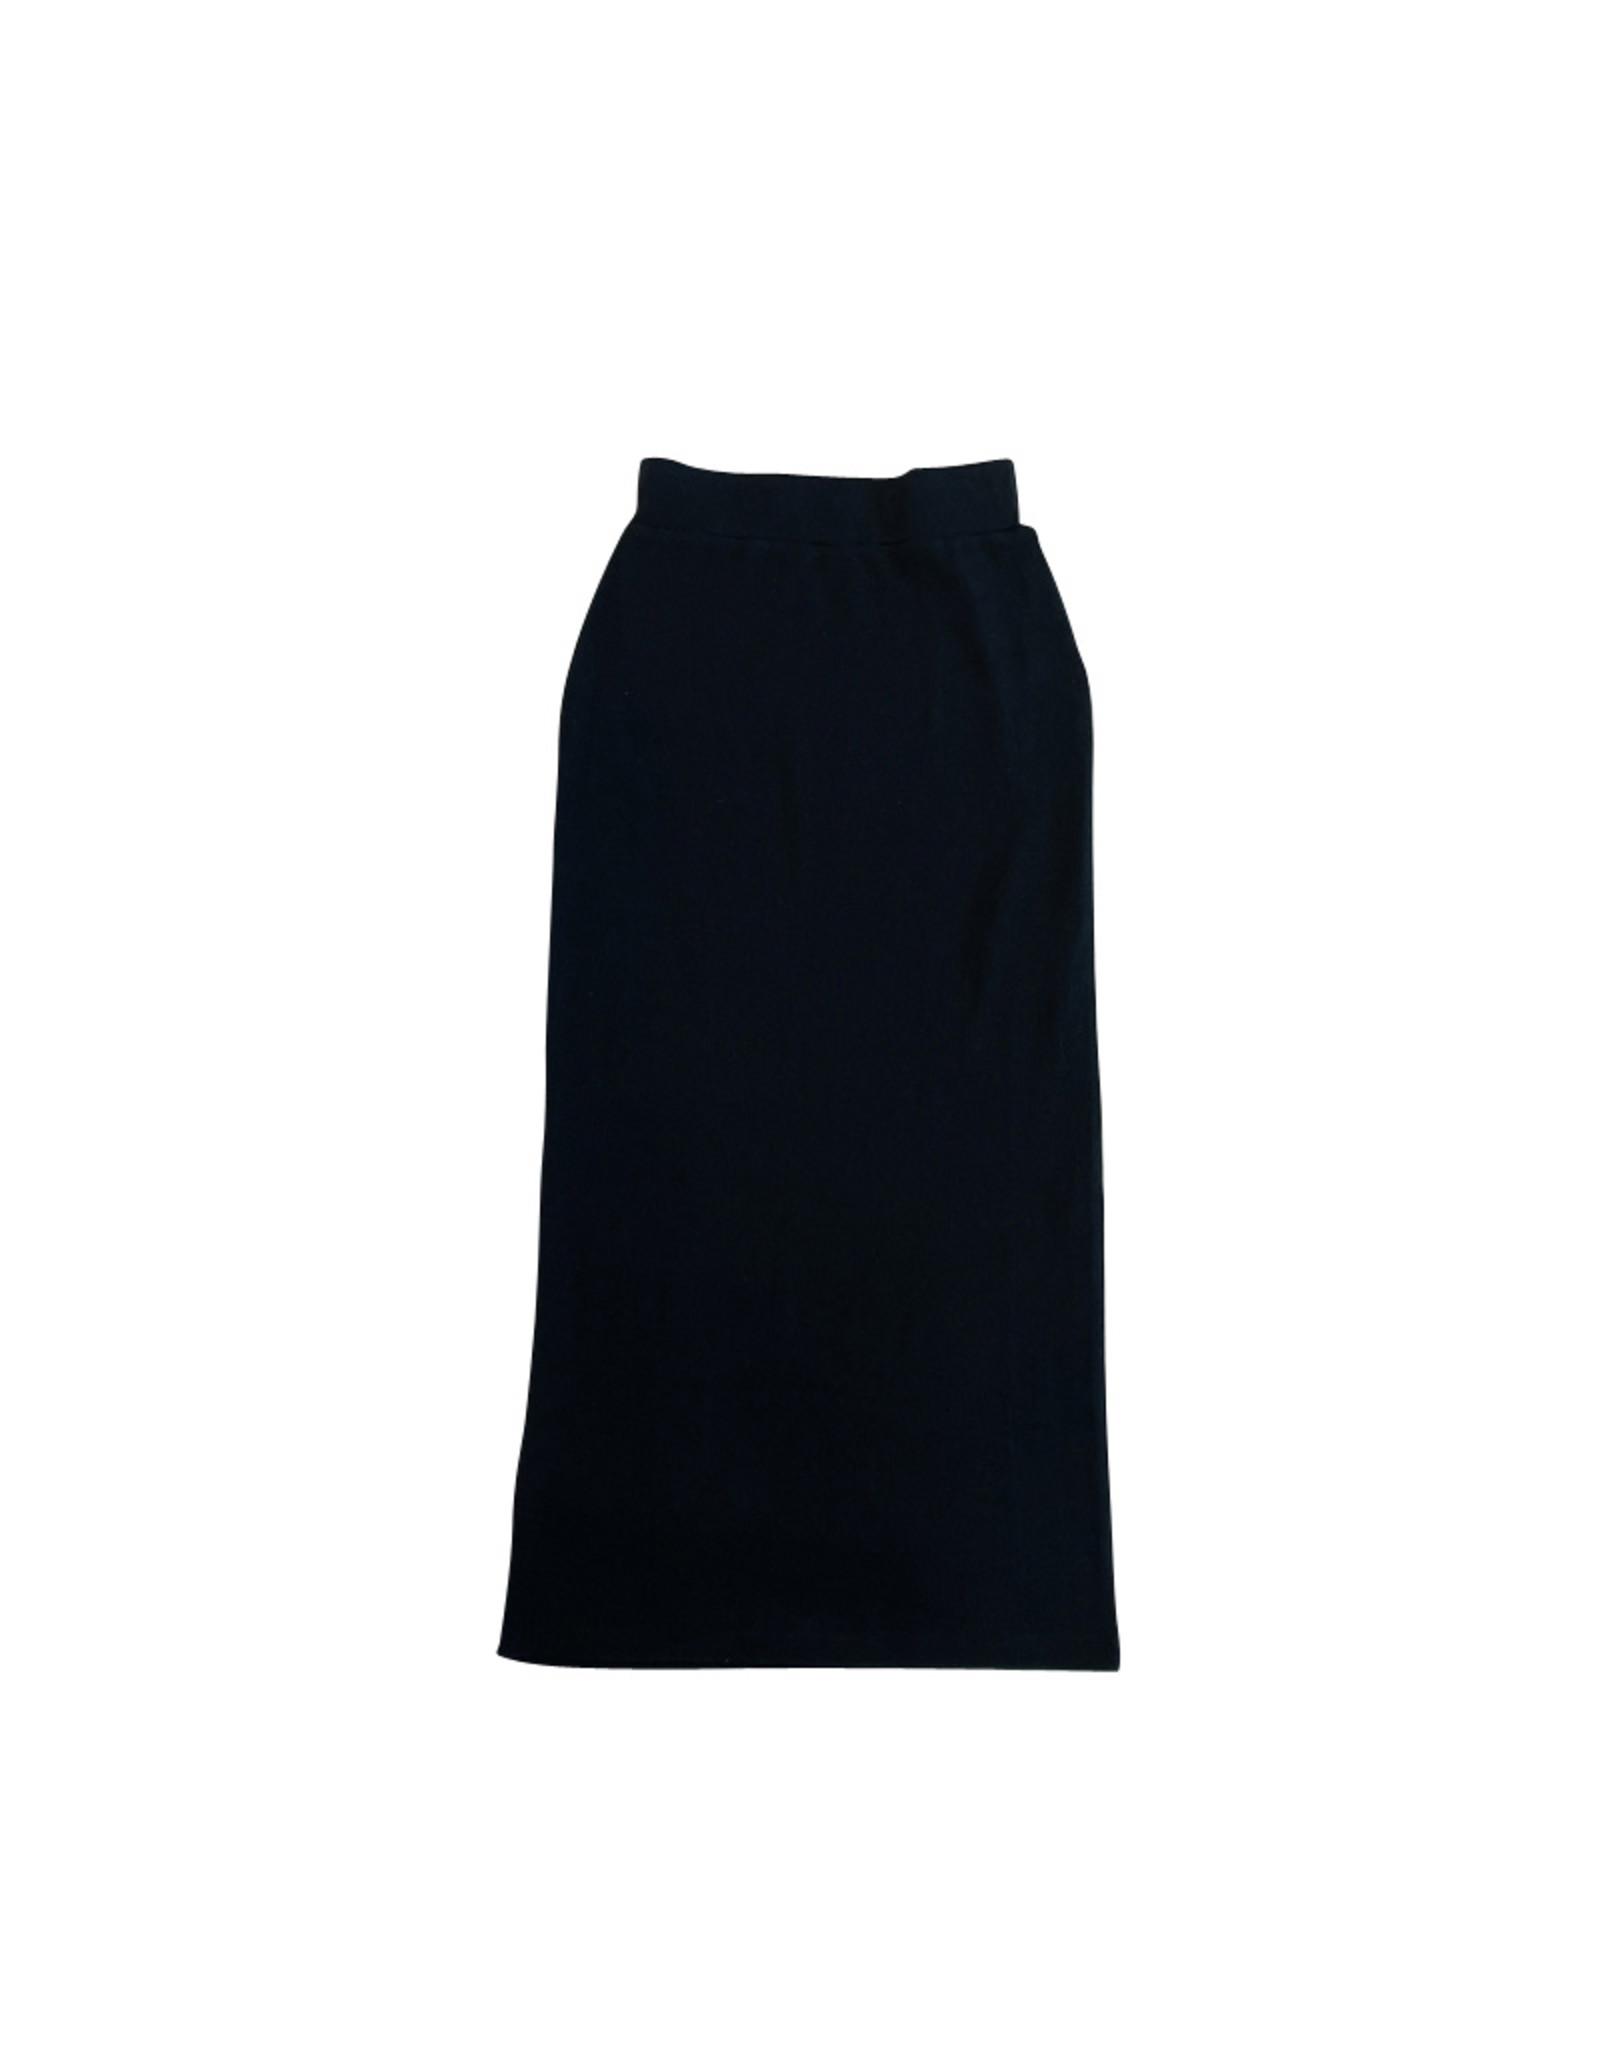 PeekABoo Peek A Boo Long Straight Ribbed Skirt